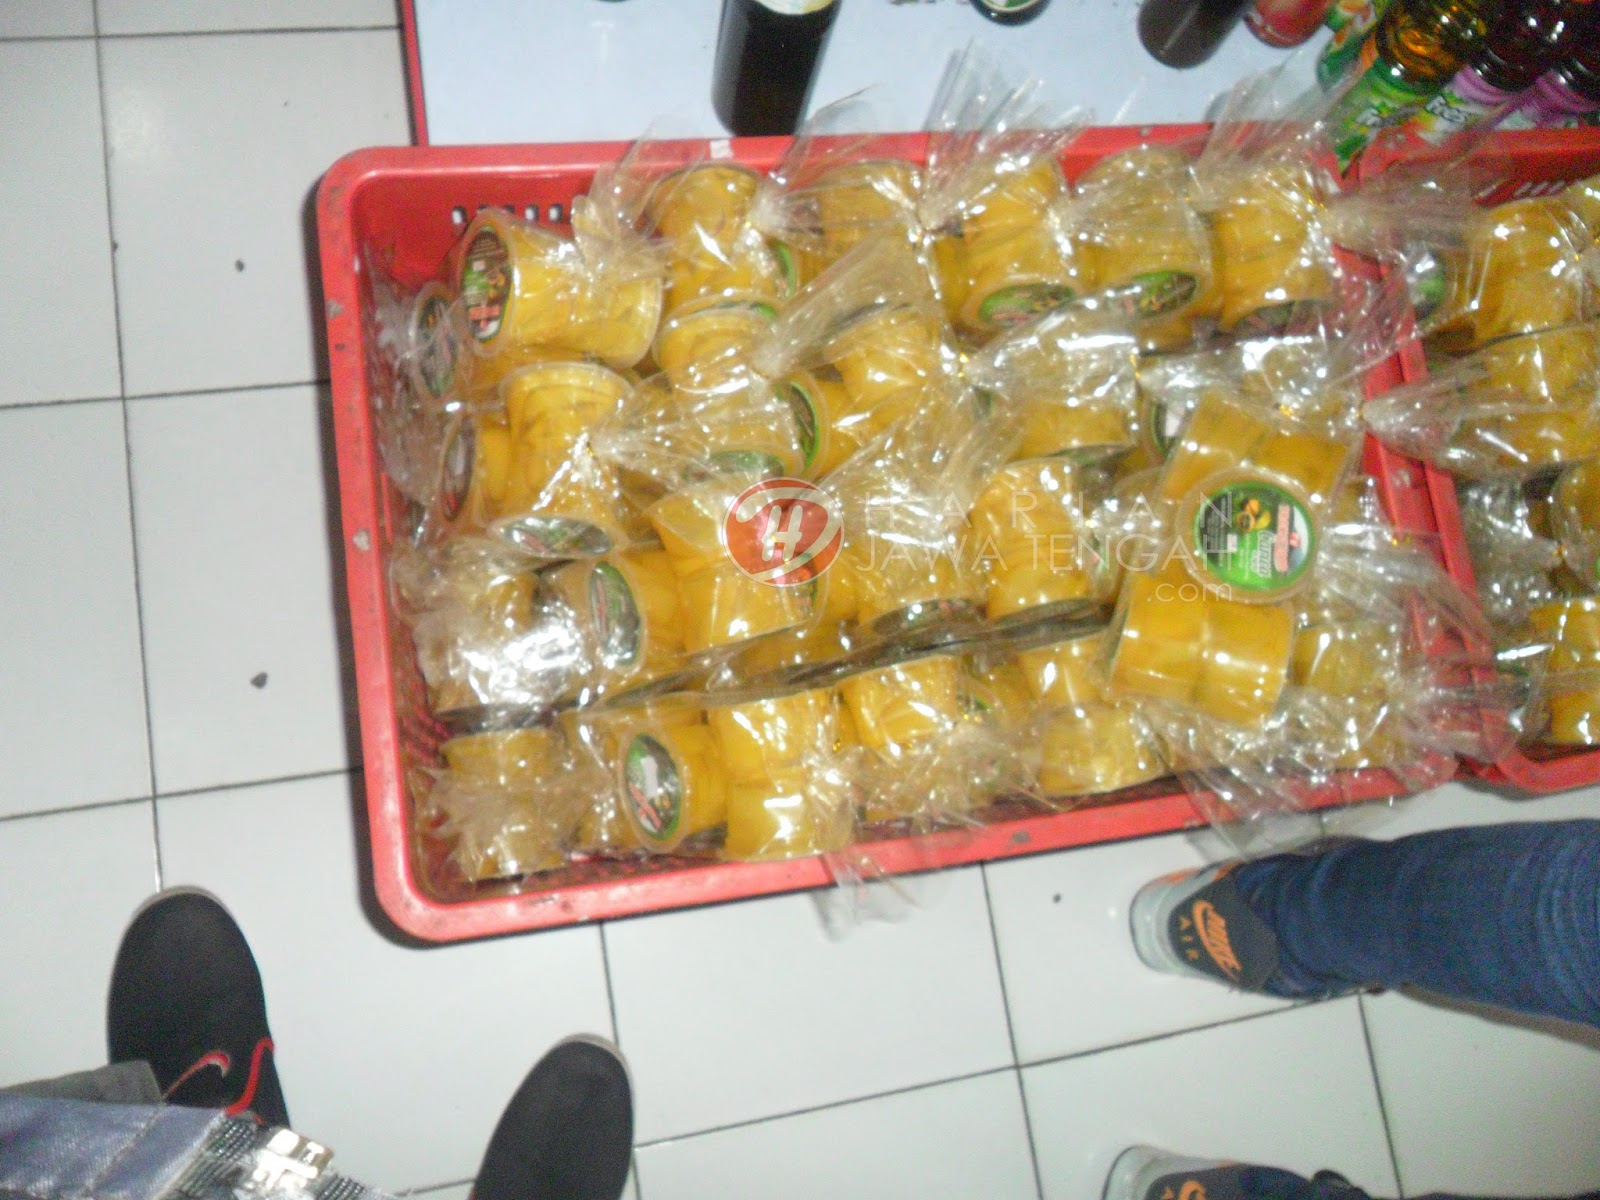 Carica Wonosobo Jadi Kuliner Nusantara Harian Jateng